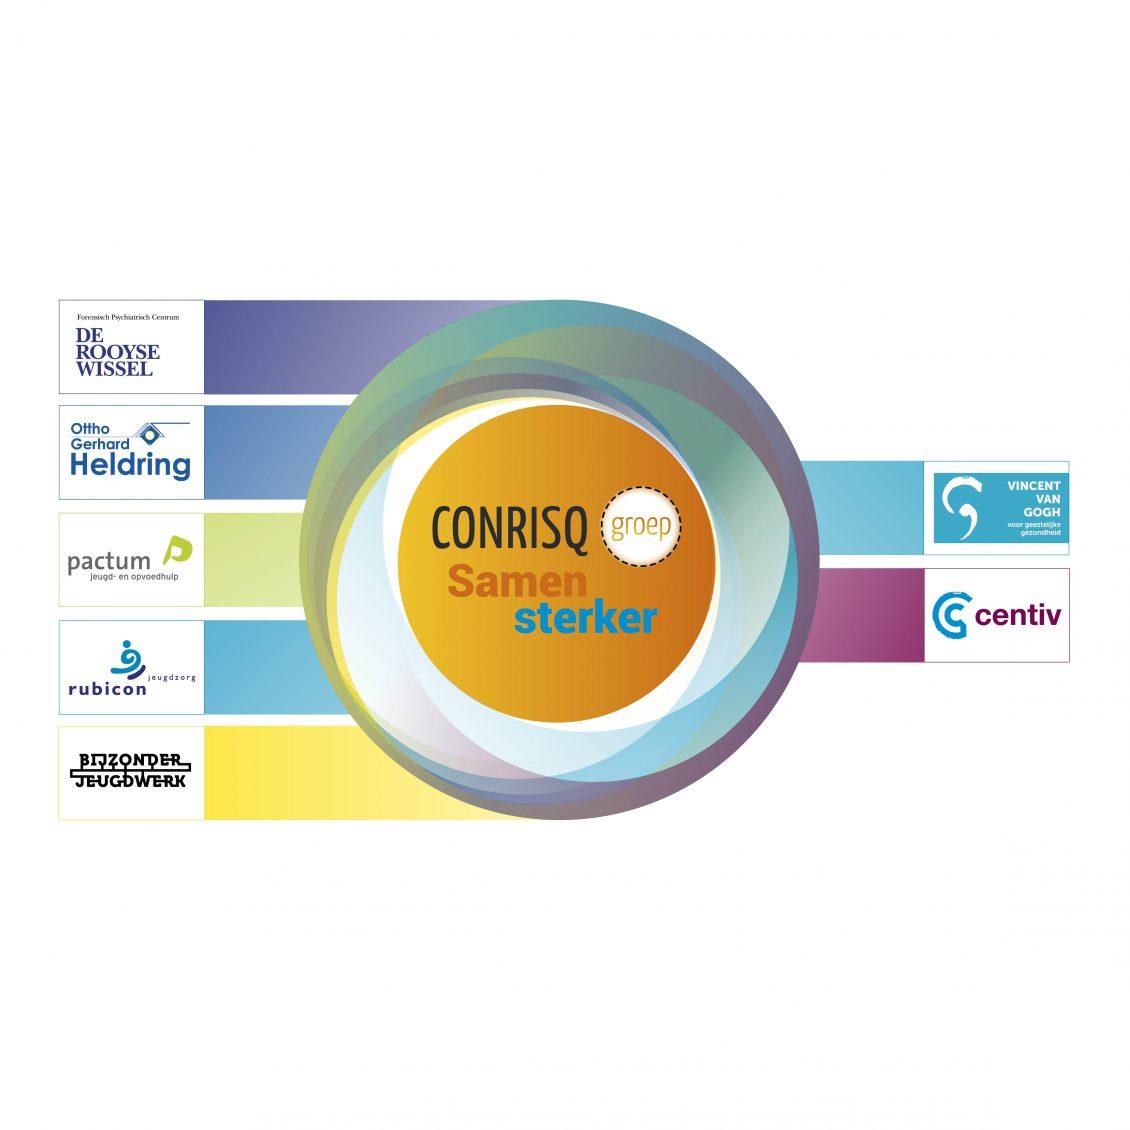 SN_conrisq